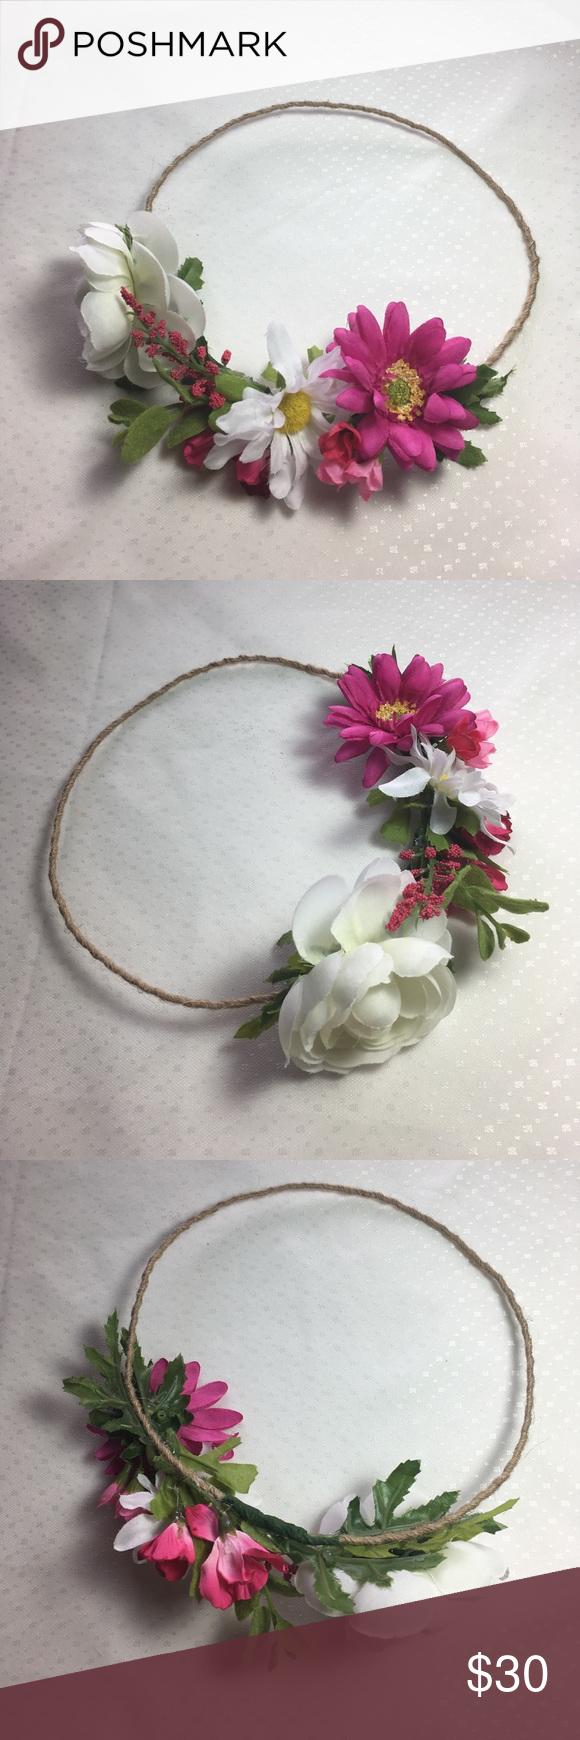 Flower Crown Festival Bohemian Wedding Pink White Gorgeous Handmade